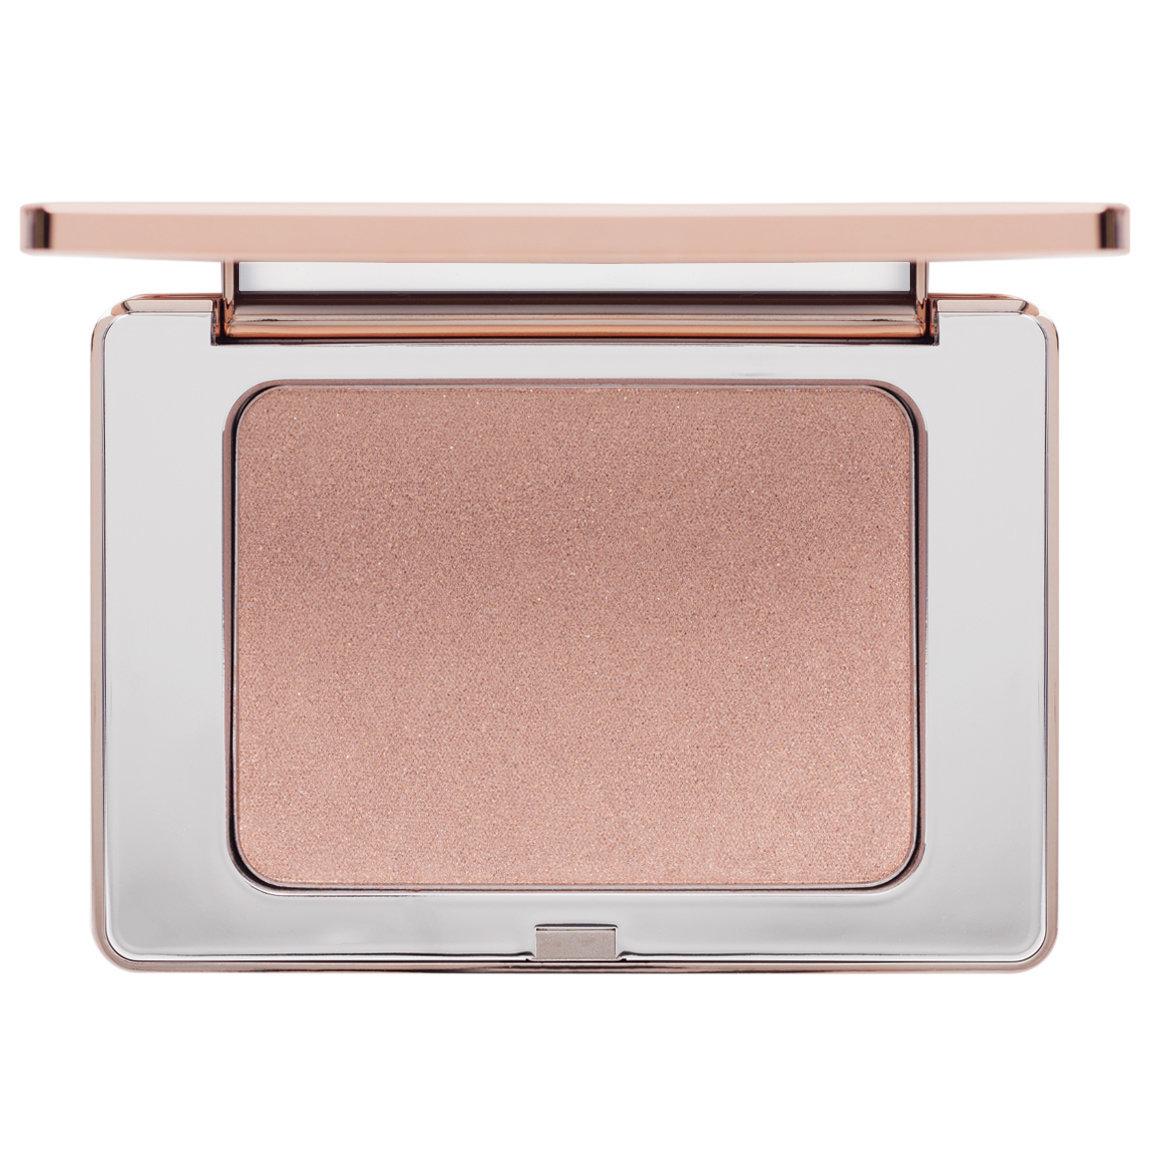 Natasha Denona All Over Glow Face & Body Shimmer in Powder 02 Medium alternative view 1 - product swatch.